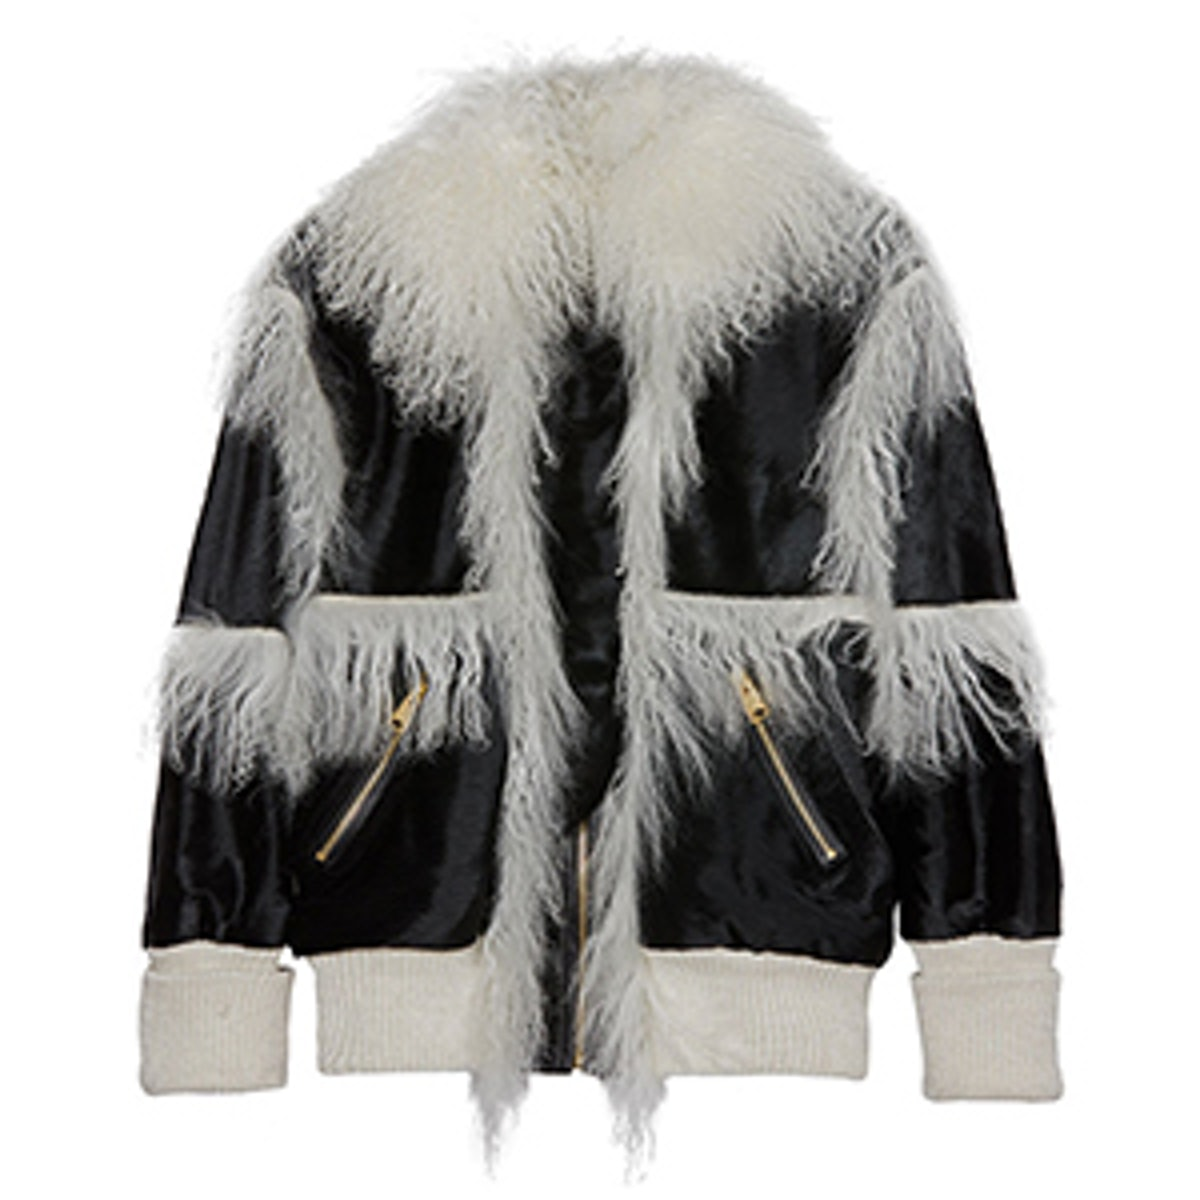 Lyla Shearling Leather Coat